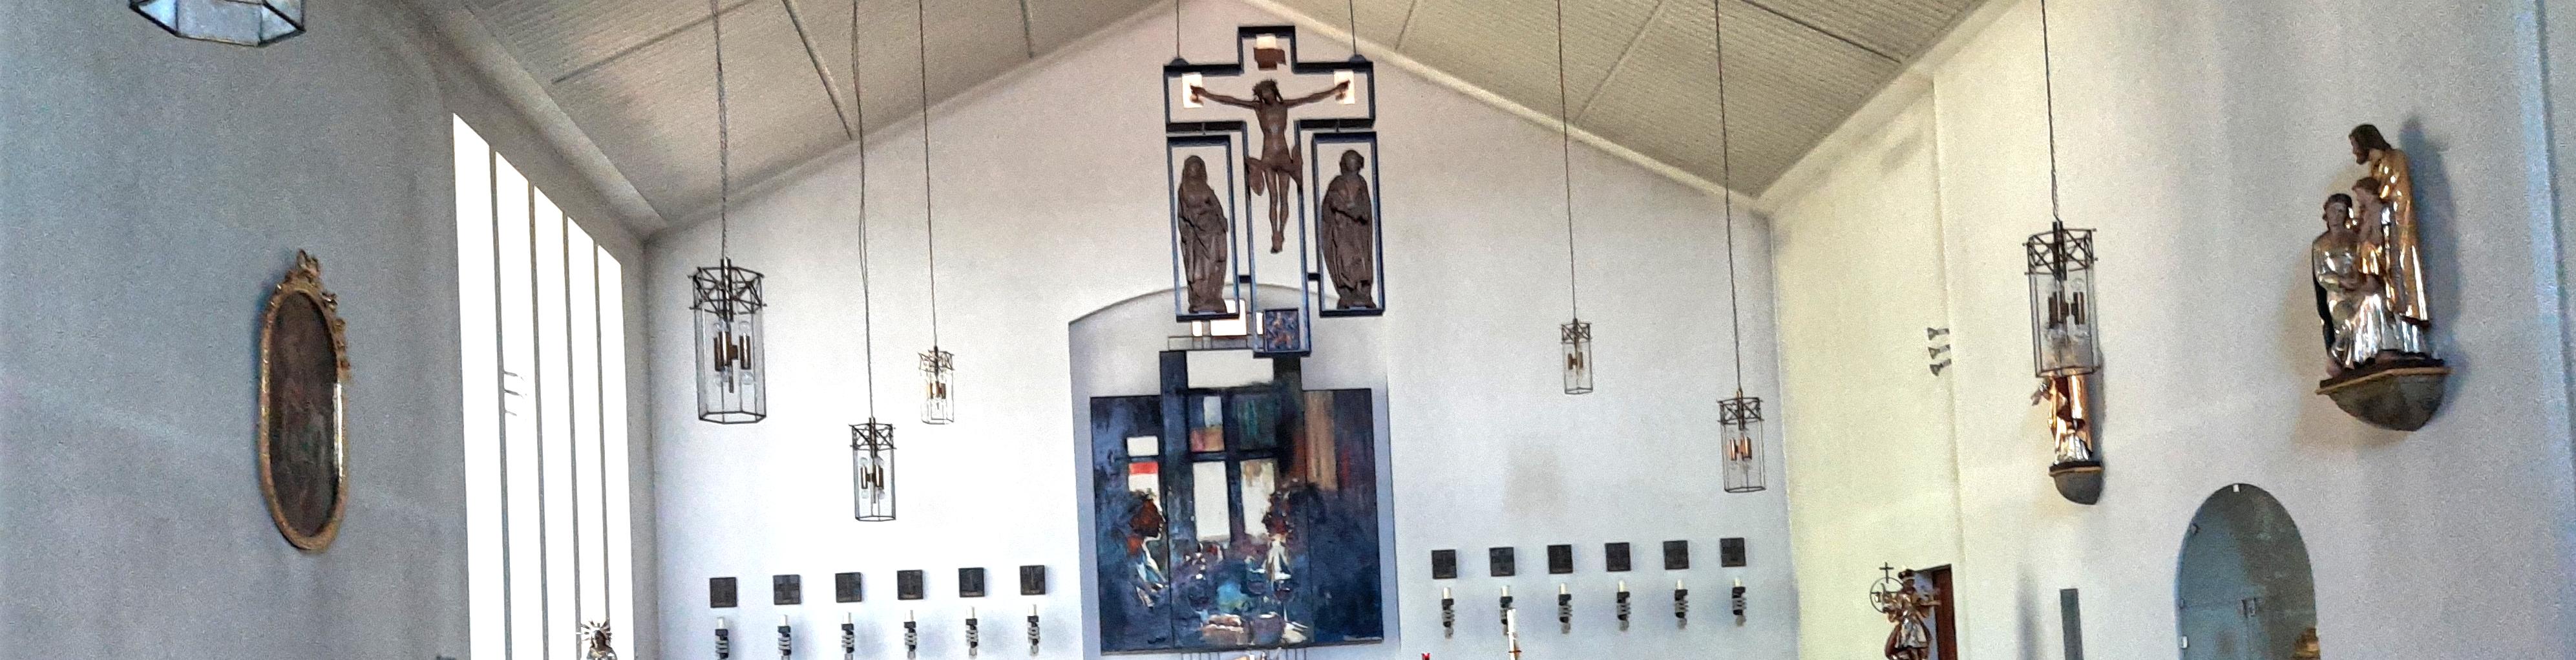 Ramsthal: Pfarrkirche St. Vitus